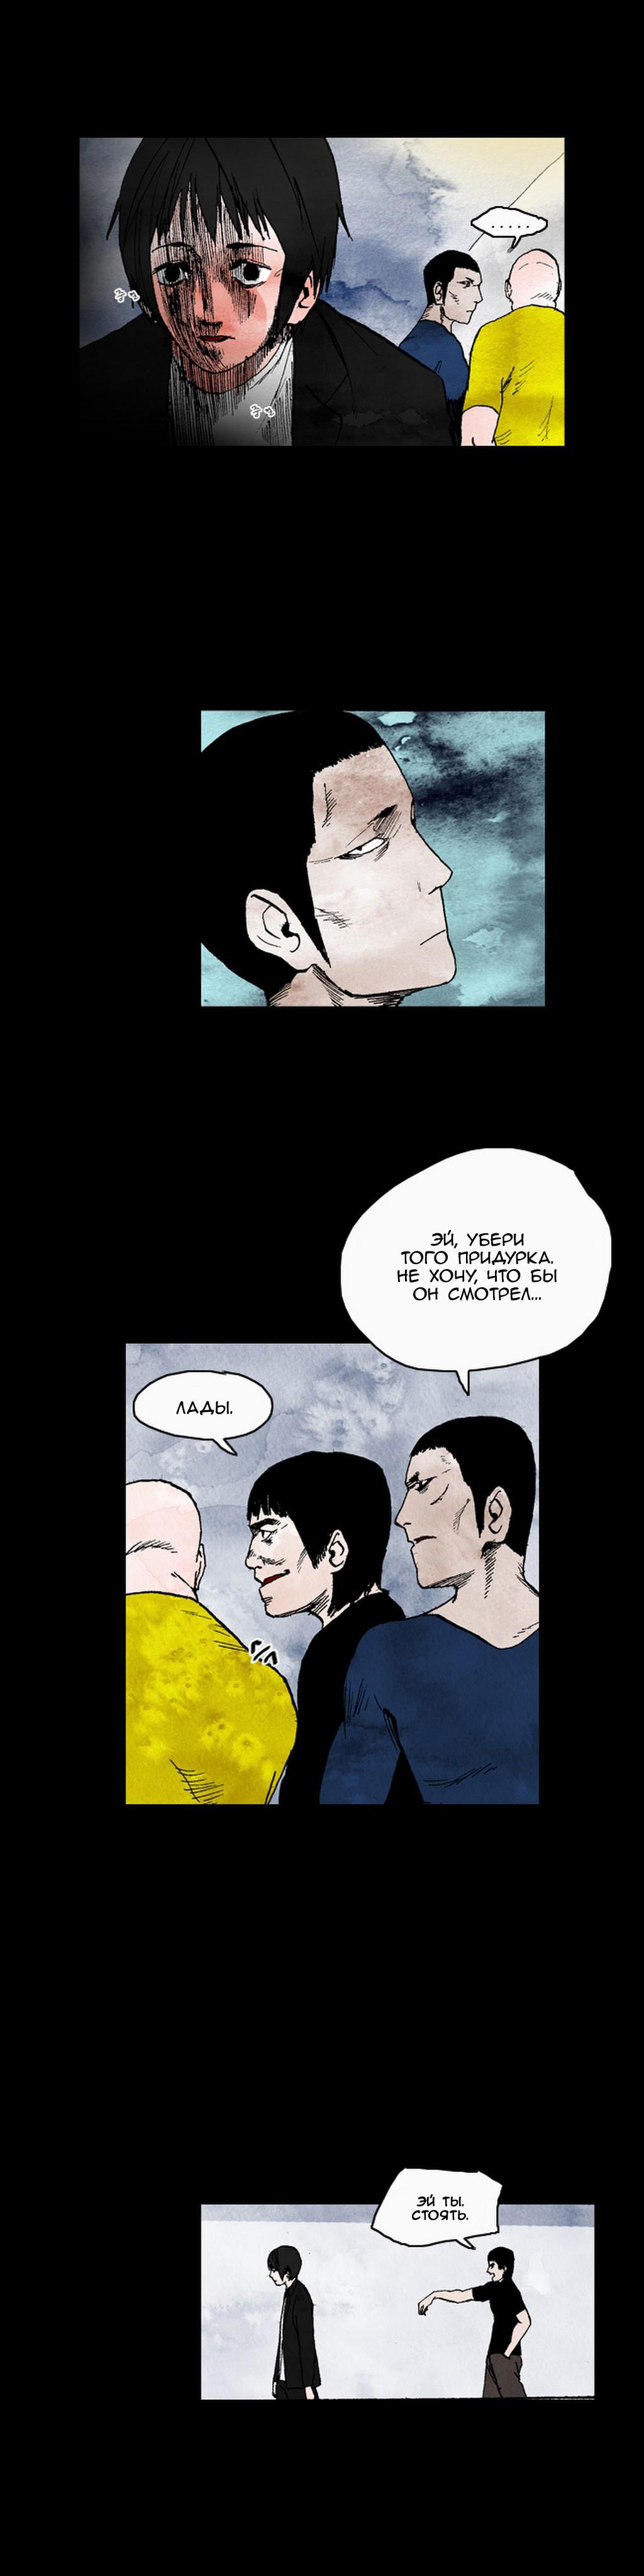 https://r1.ninemanga.com/comics/pic2/14/28302/304176/1466651622548.jpg Page 3